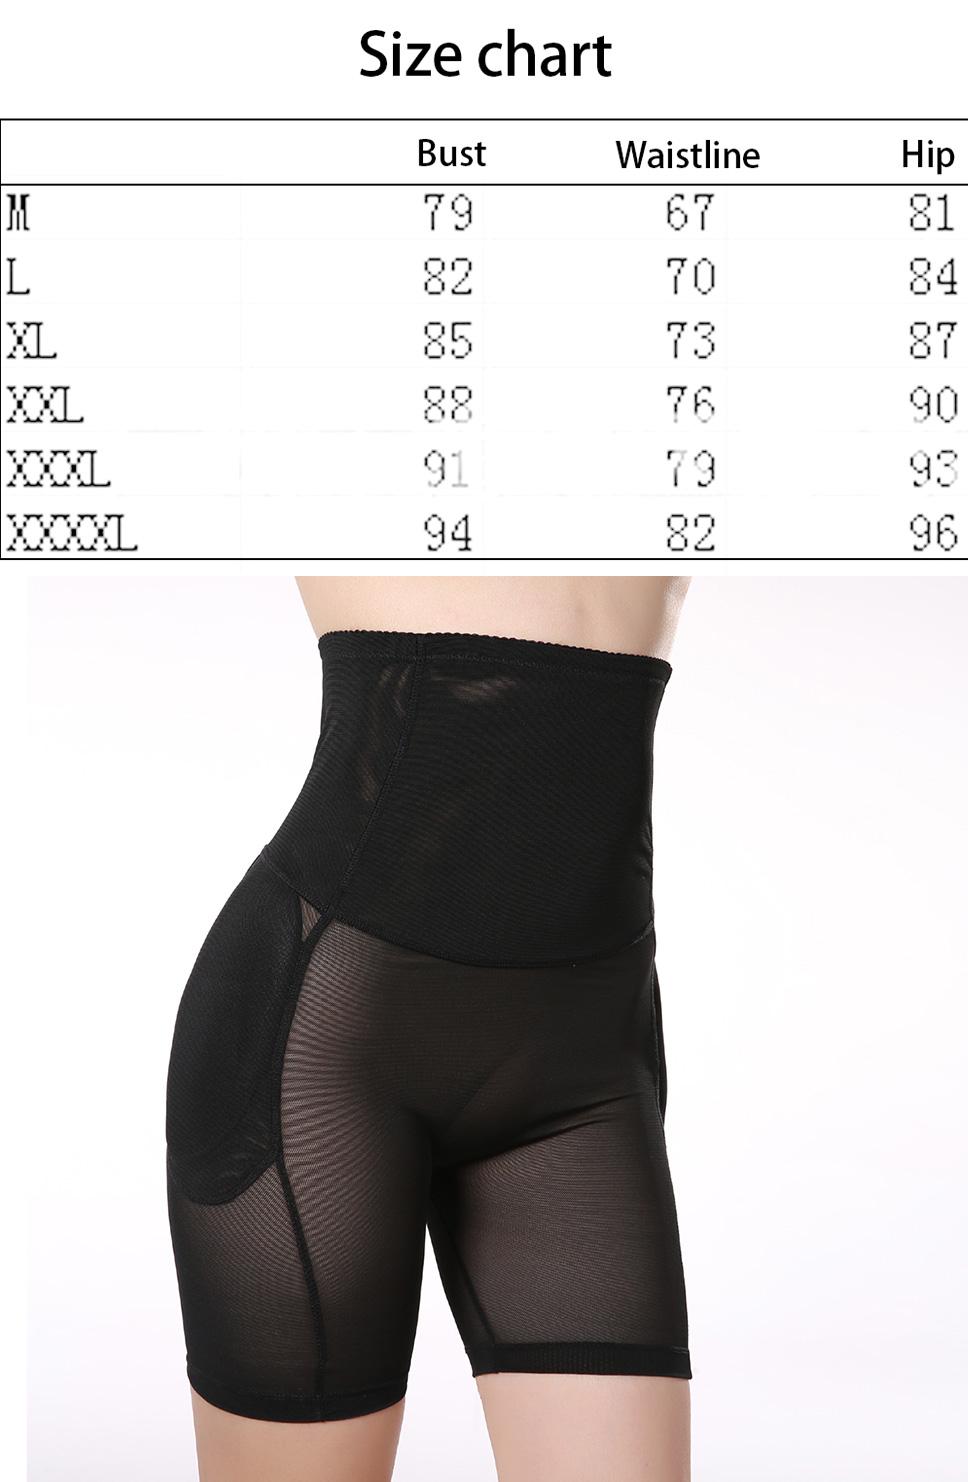 3f8d23d1b97 Womens Butt Lifter Shapewear Padded Control Panties - Free shipping ...